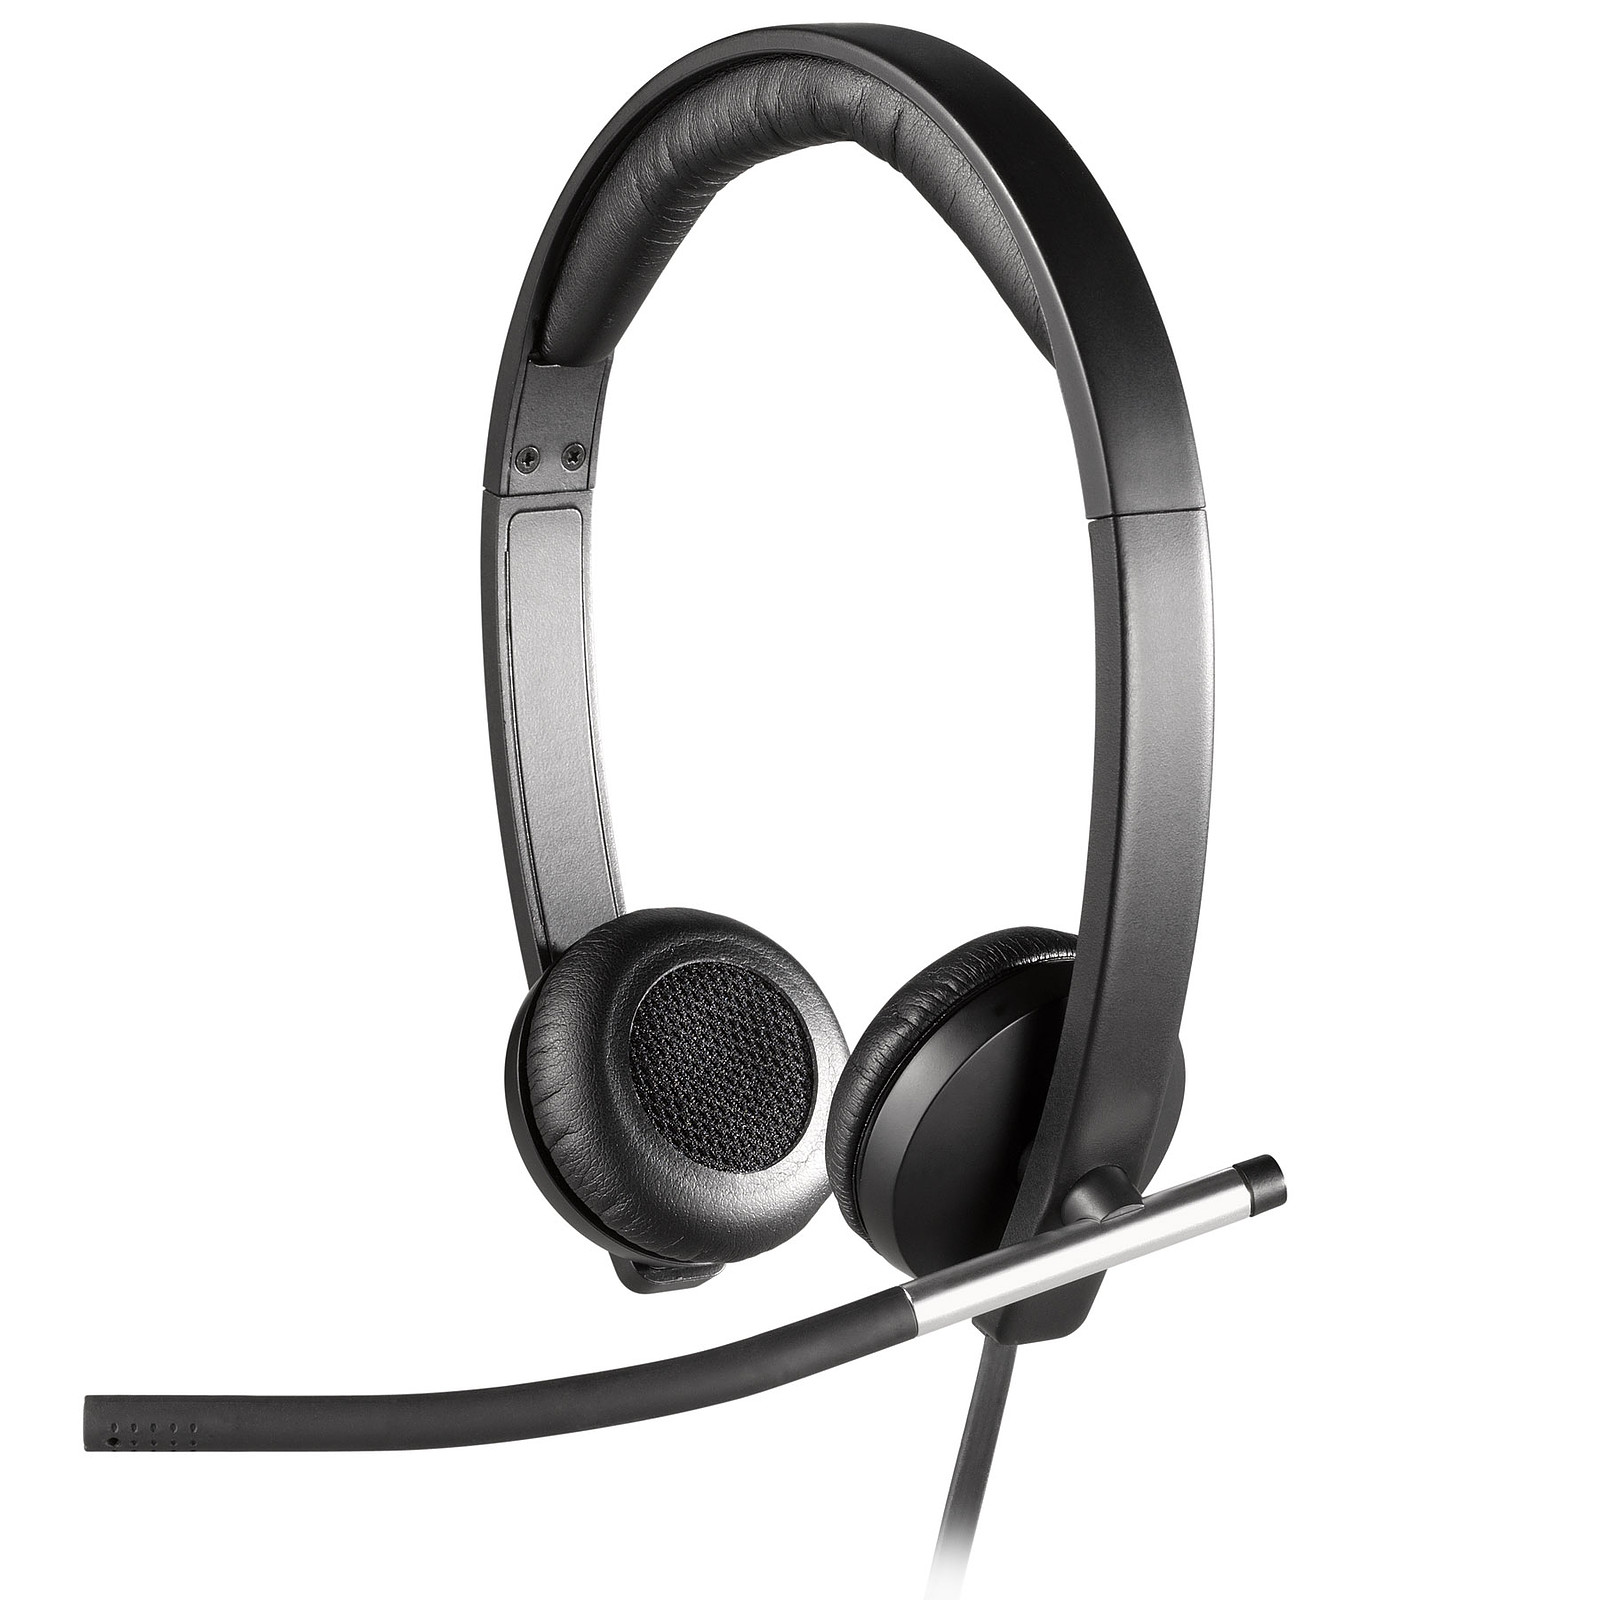 Logitech USB Headset estéreo H650e